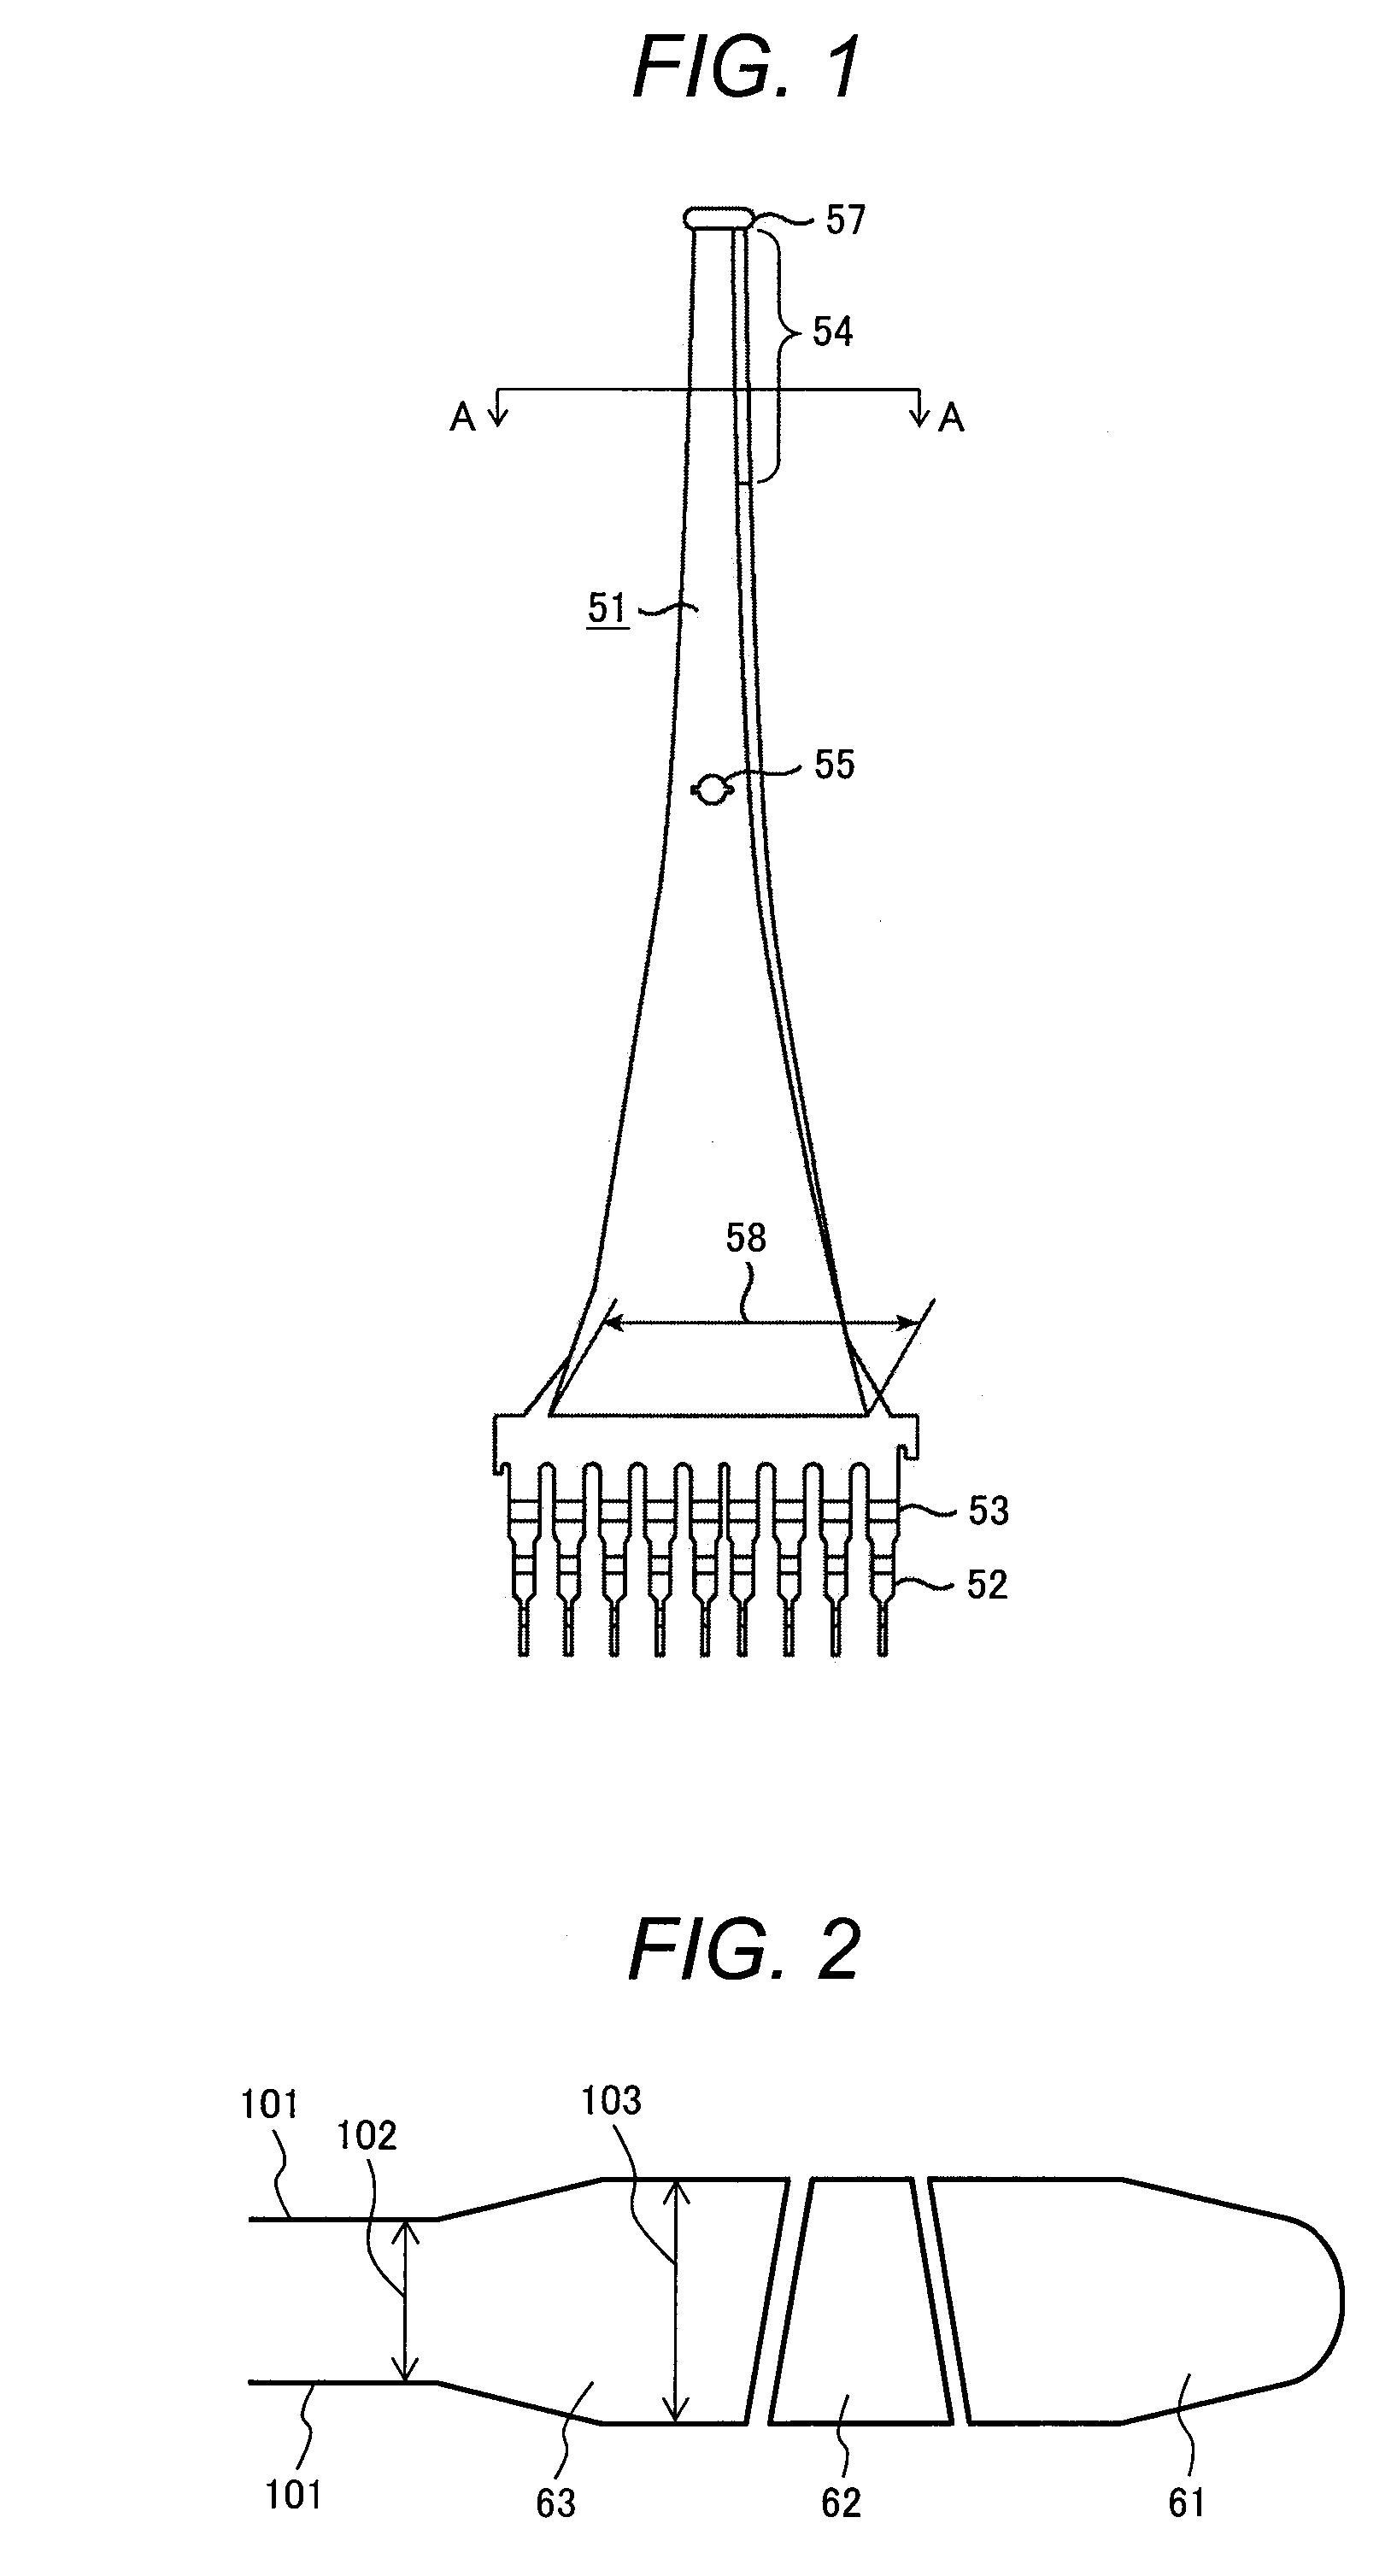 Patent US Turbine Blade and Turbine Rotor and Steam